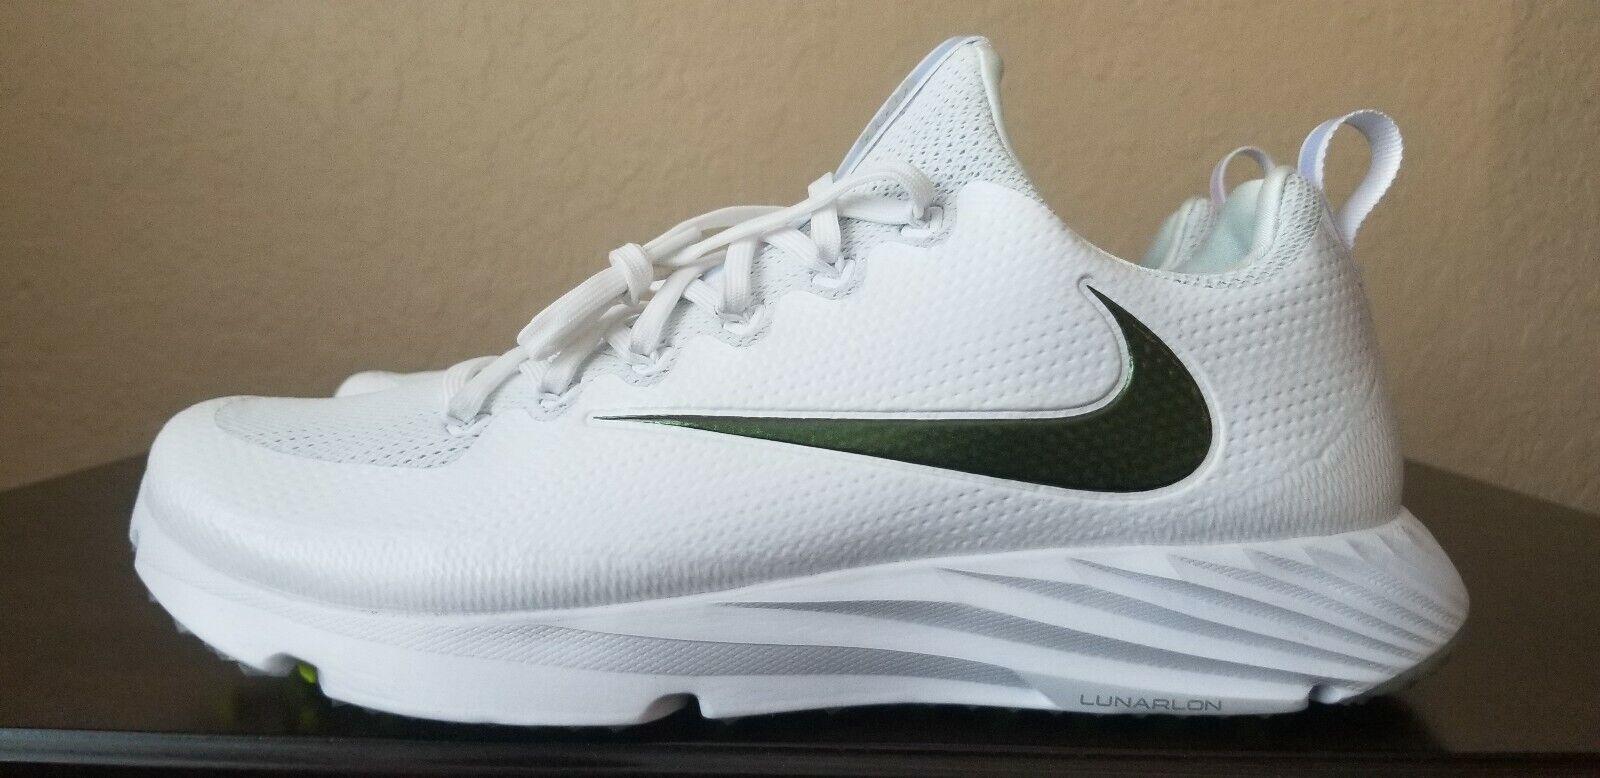 Nike Vapor Untouchable Speed Turf Football Trainer shoes 833408-112 Men's Sz 11